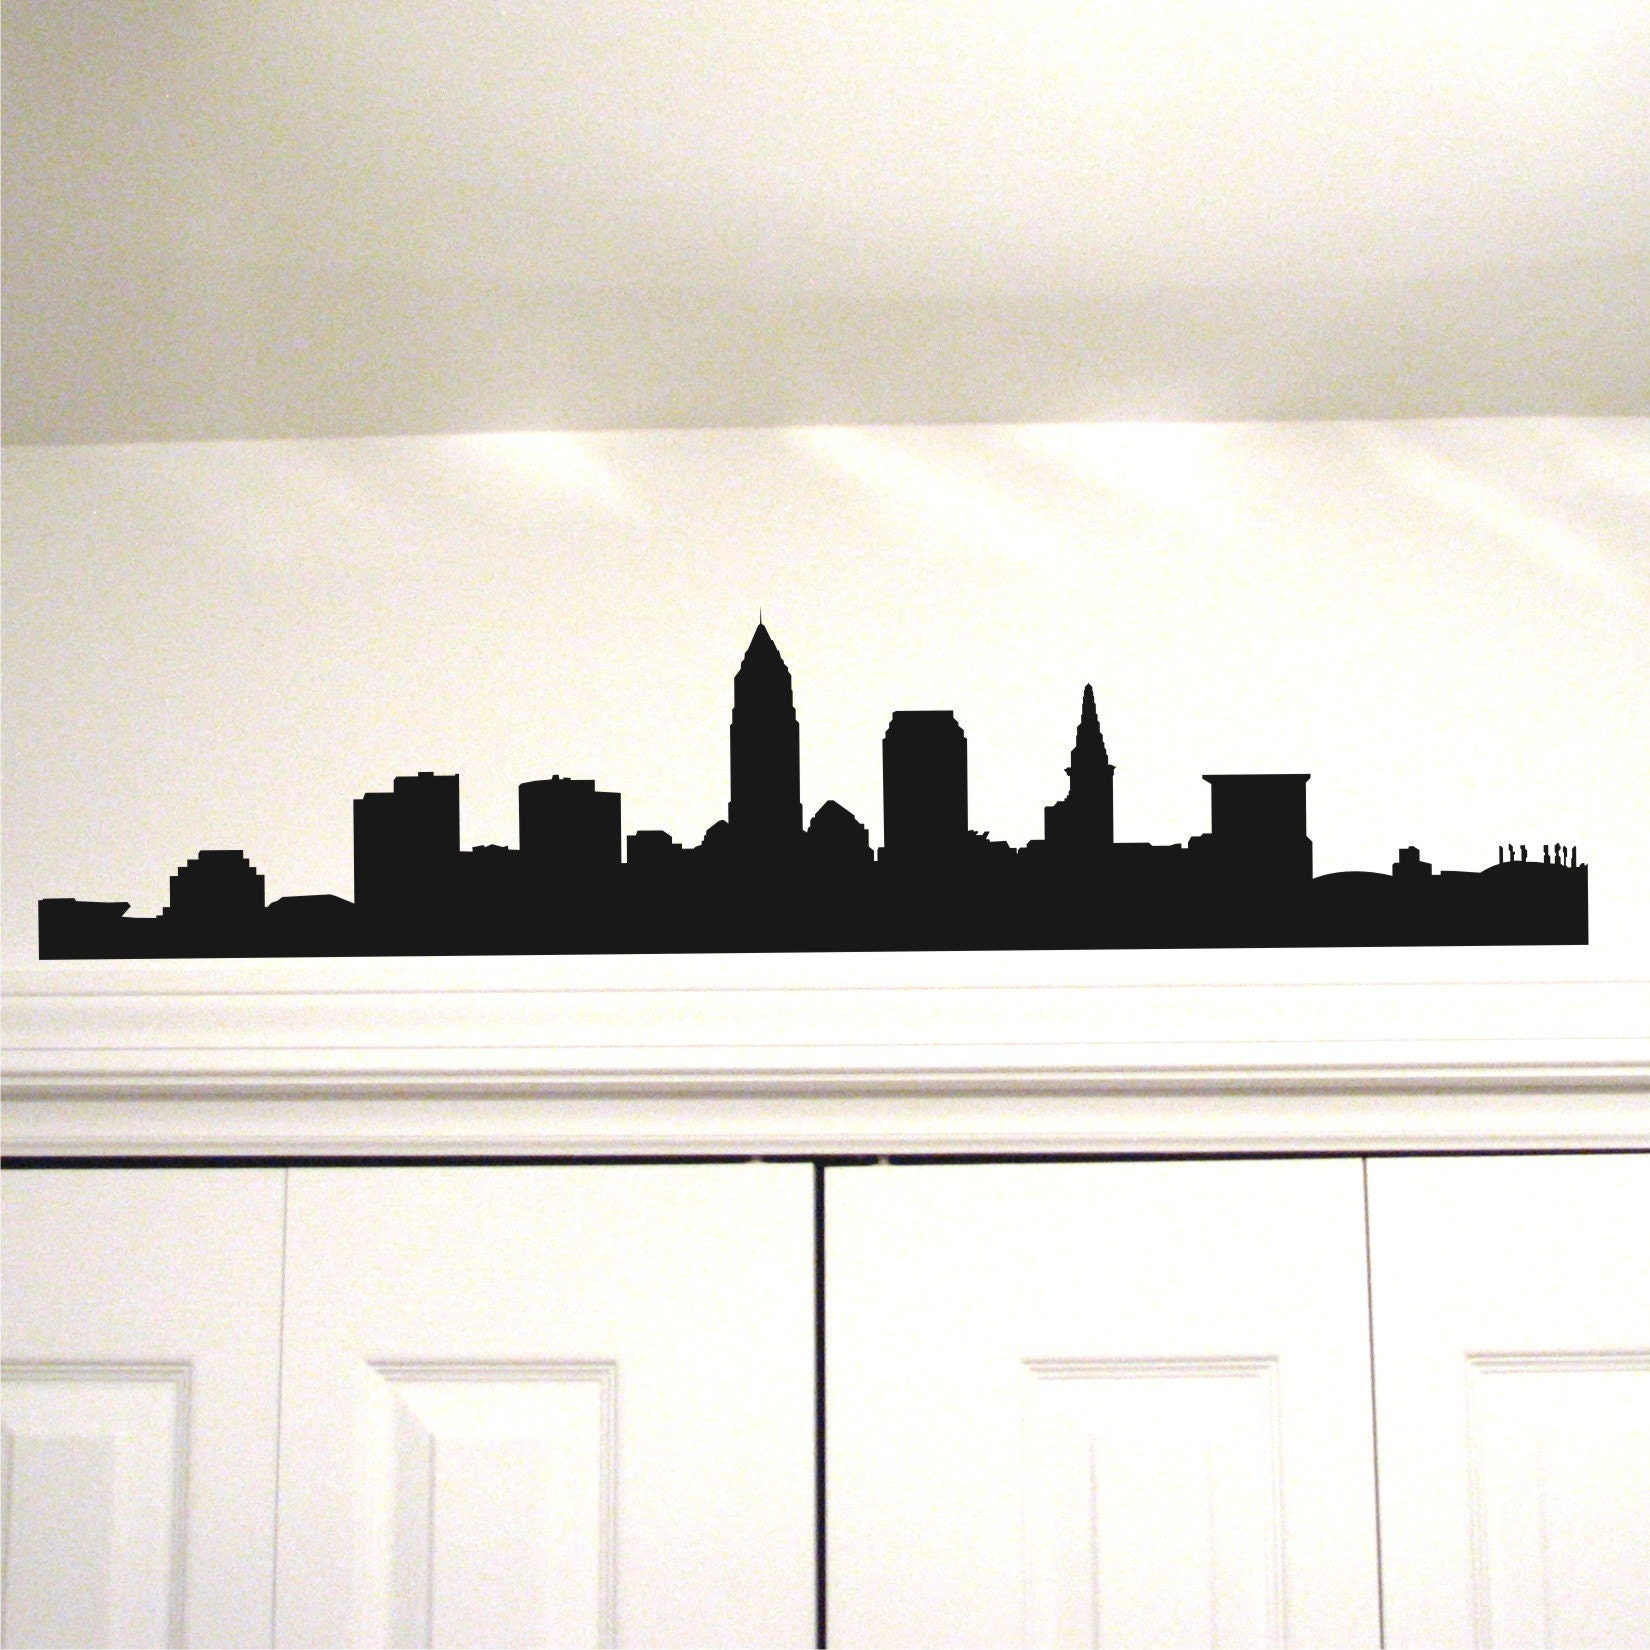 Items Similar To Cleveland Skyline Vinyl Wall Art Decal 11